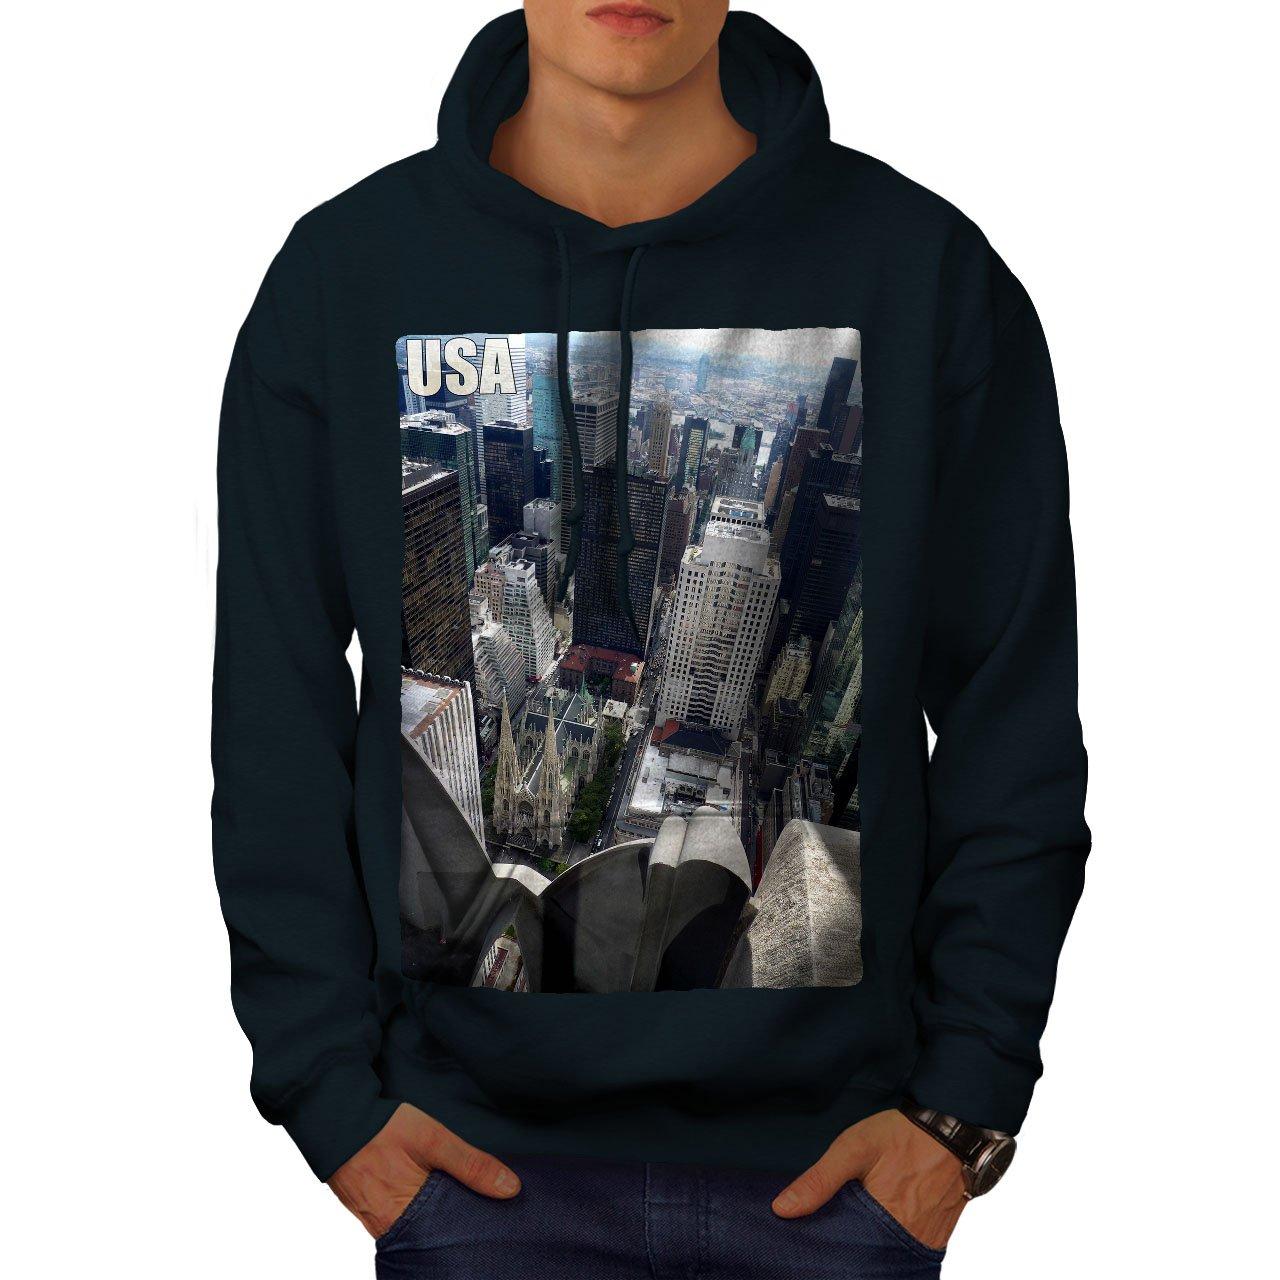 wellcoda USA Building City Mens Hoodie Town Hooded Sweatshirt